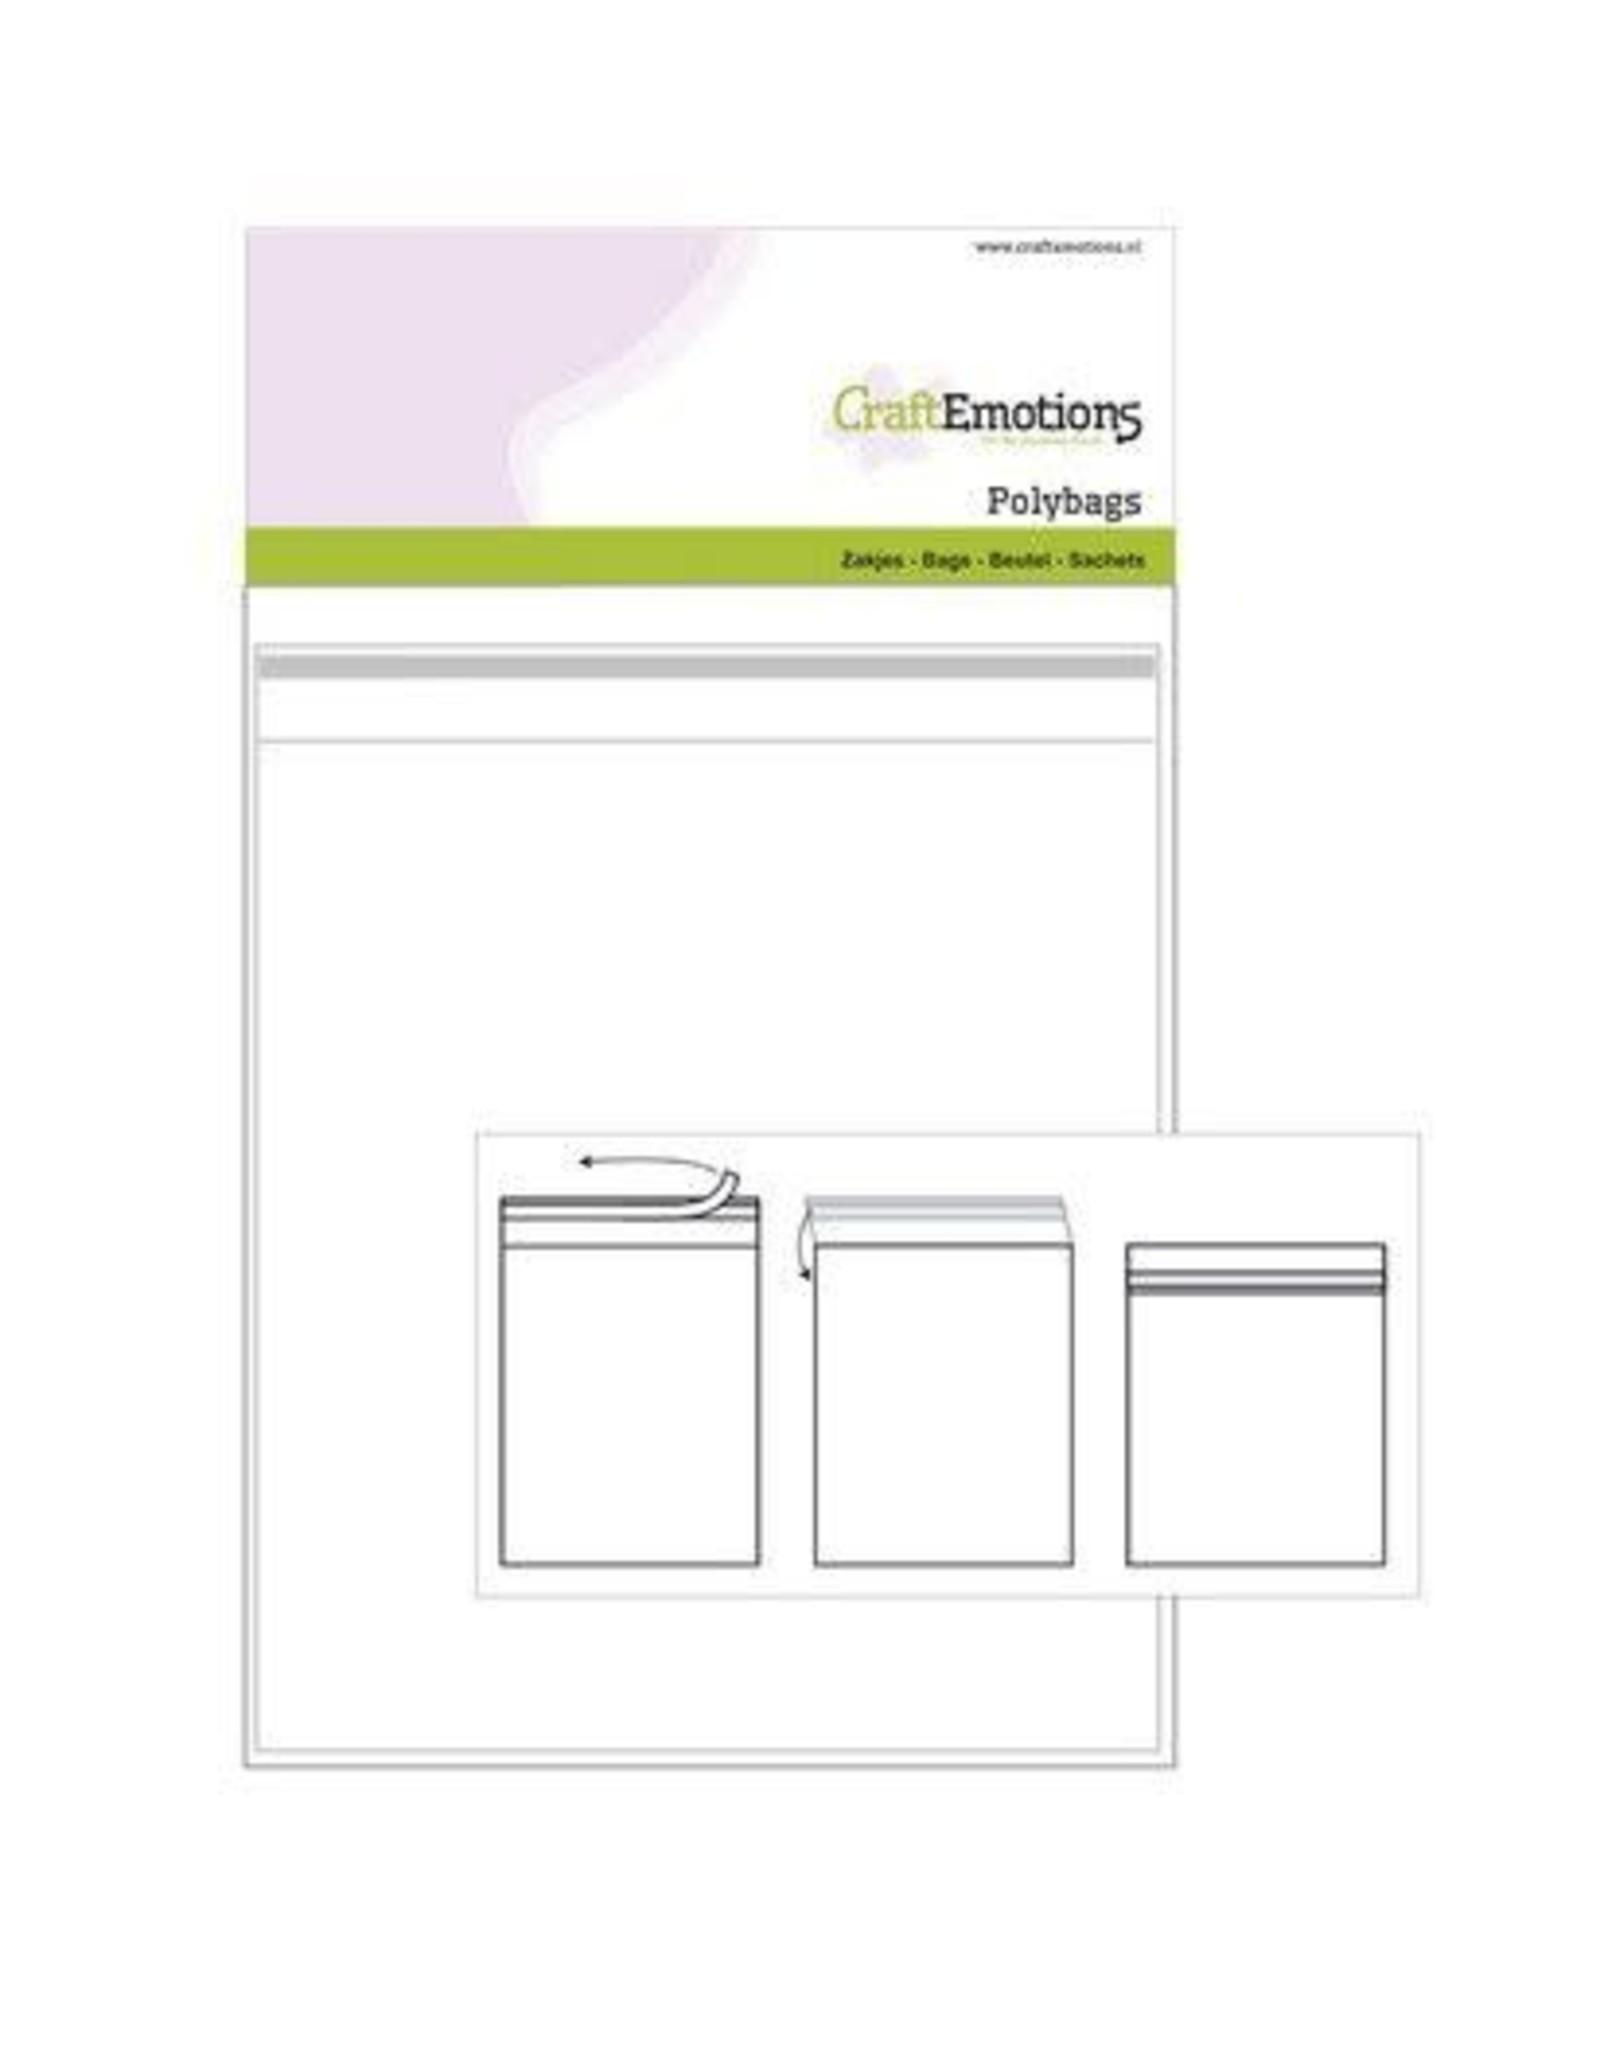 Craft Emotions CraftEmotions Zakjes zelfsluitend transparant 25st 172mmx172mm - Polybags